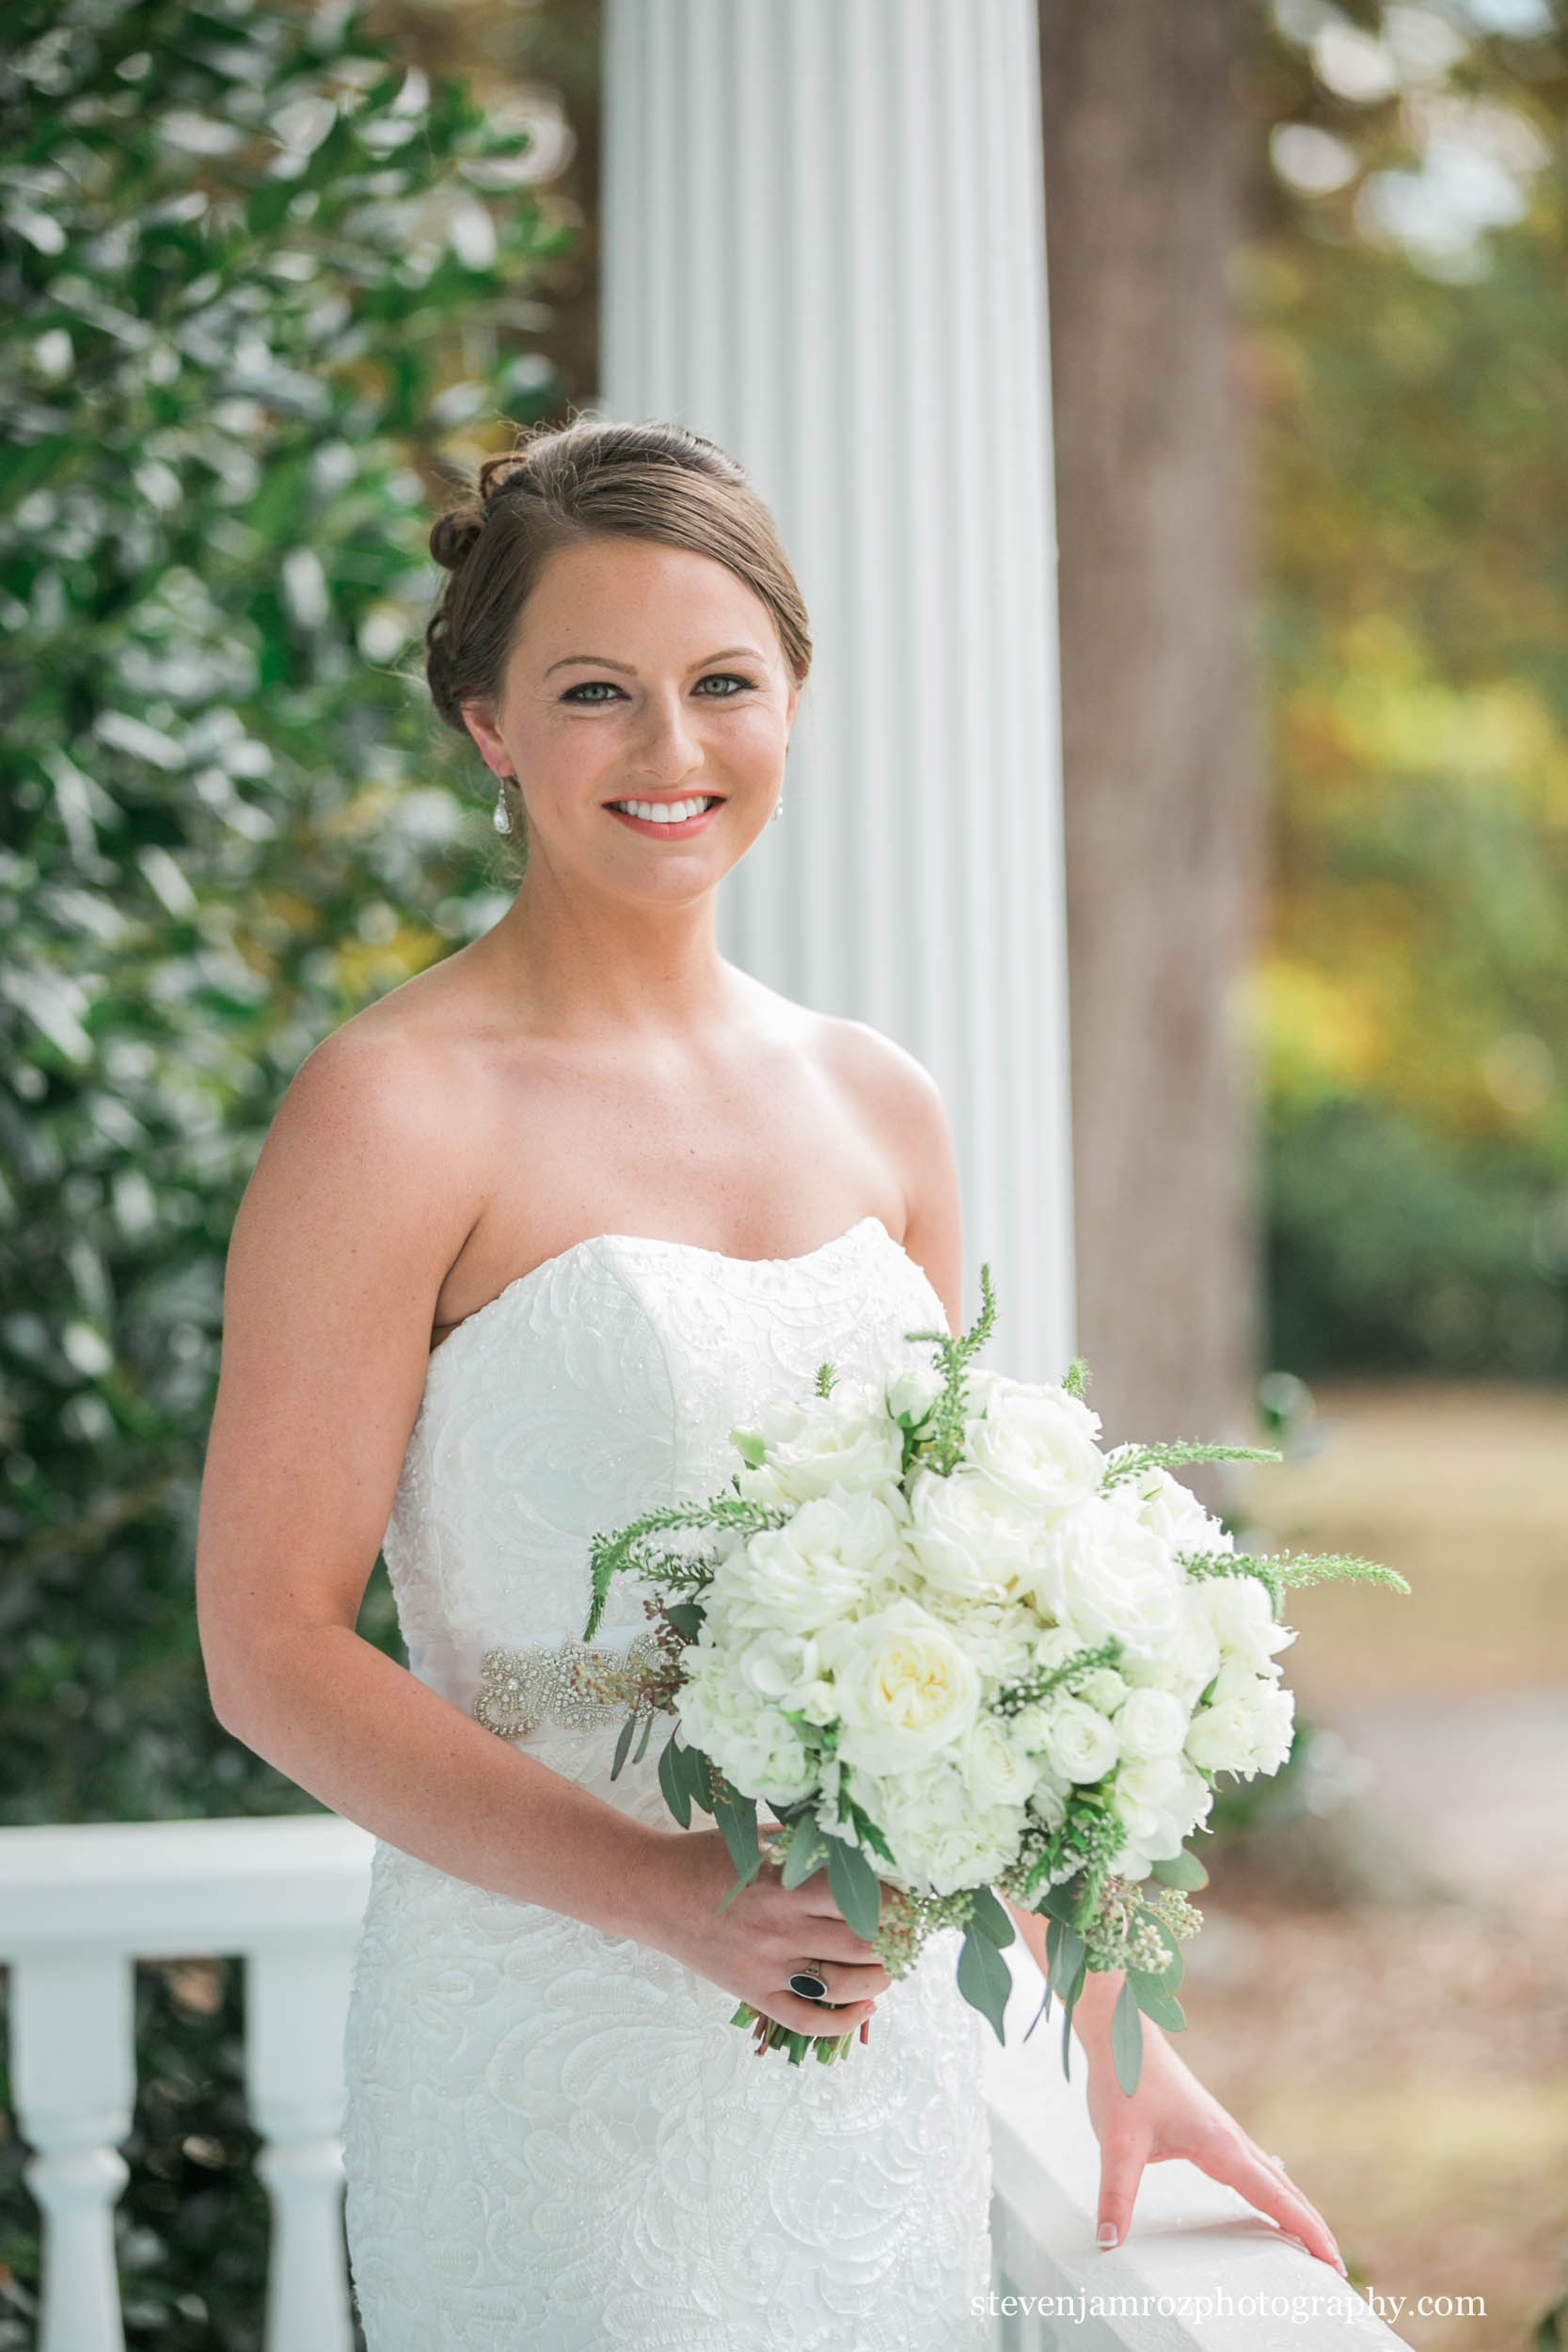 bride-holding-bouquet-hudson-manor-steven-jamroz-photography-0084.jpg